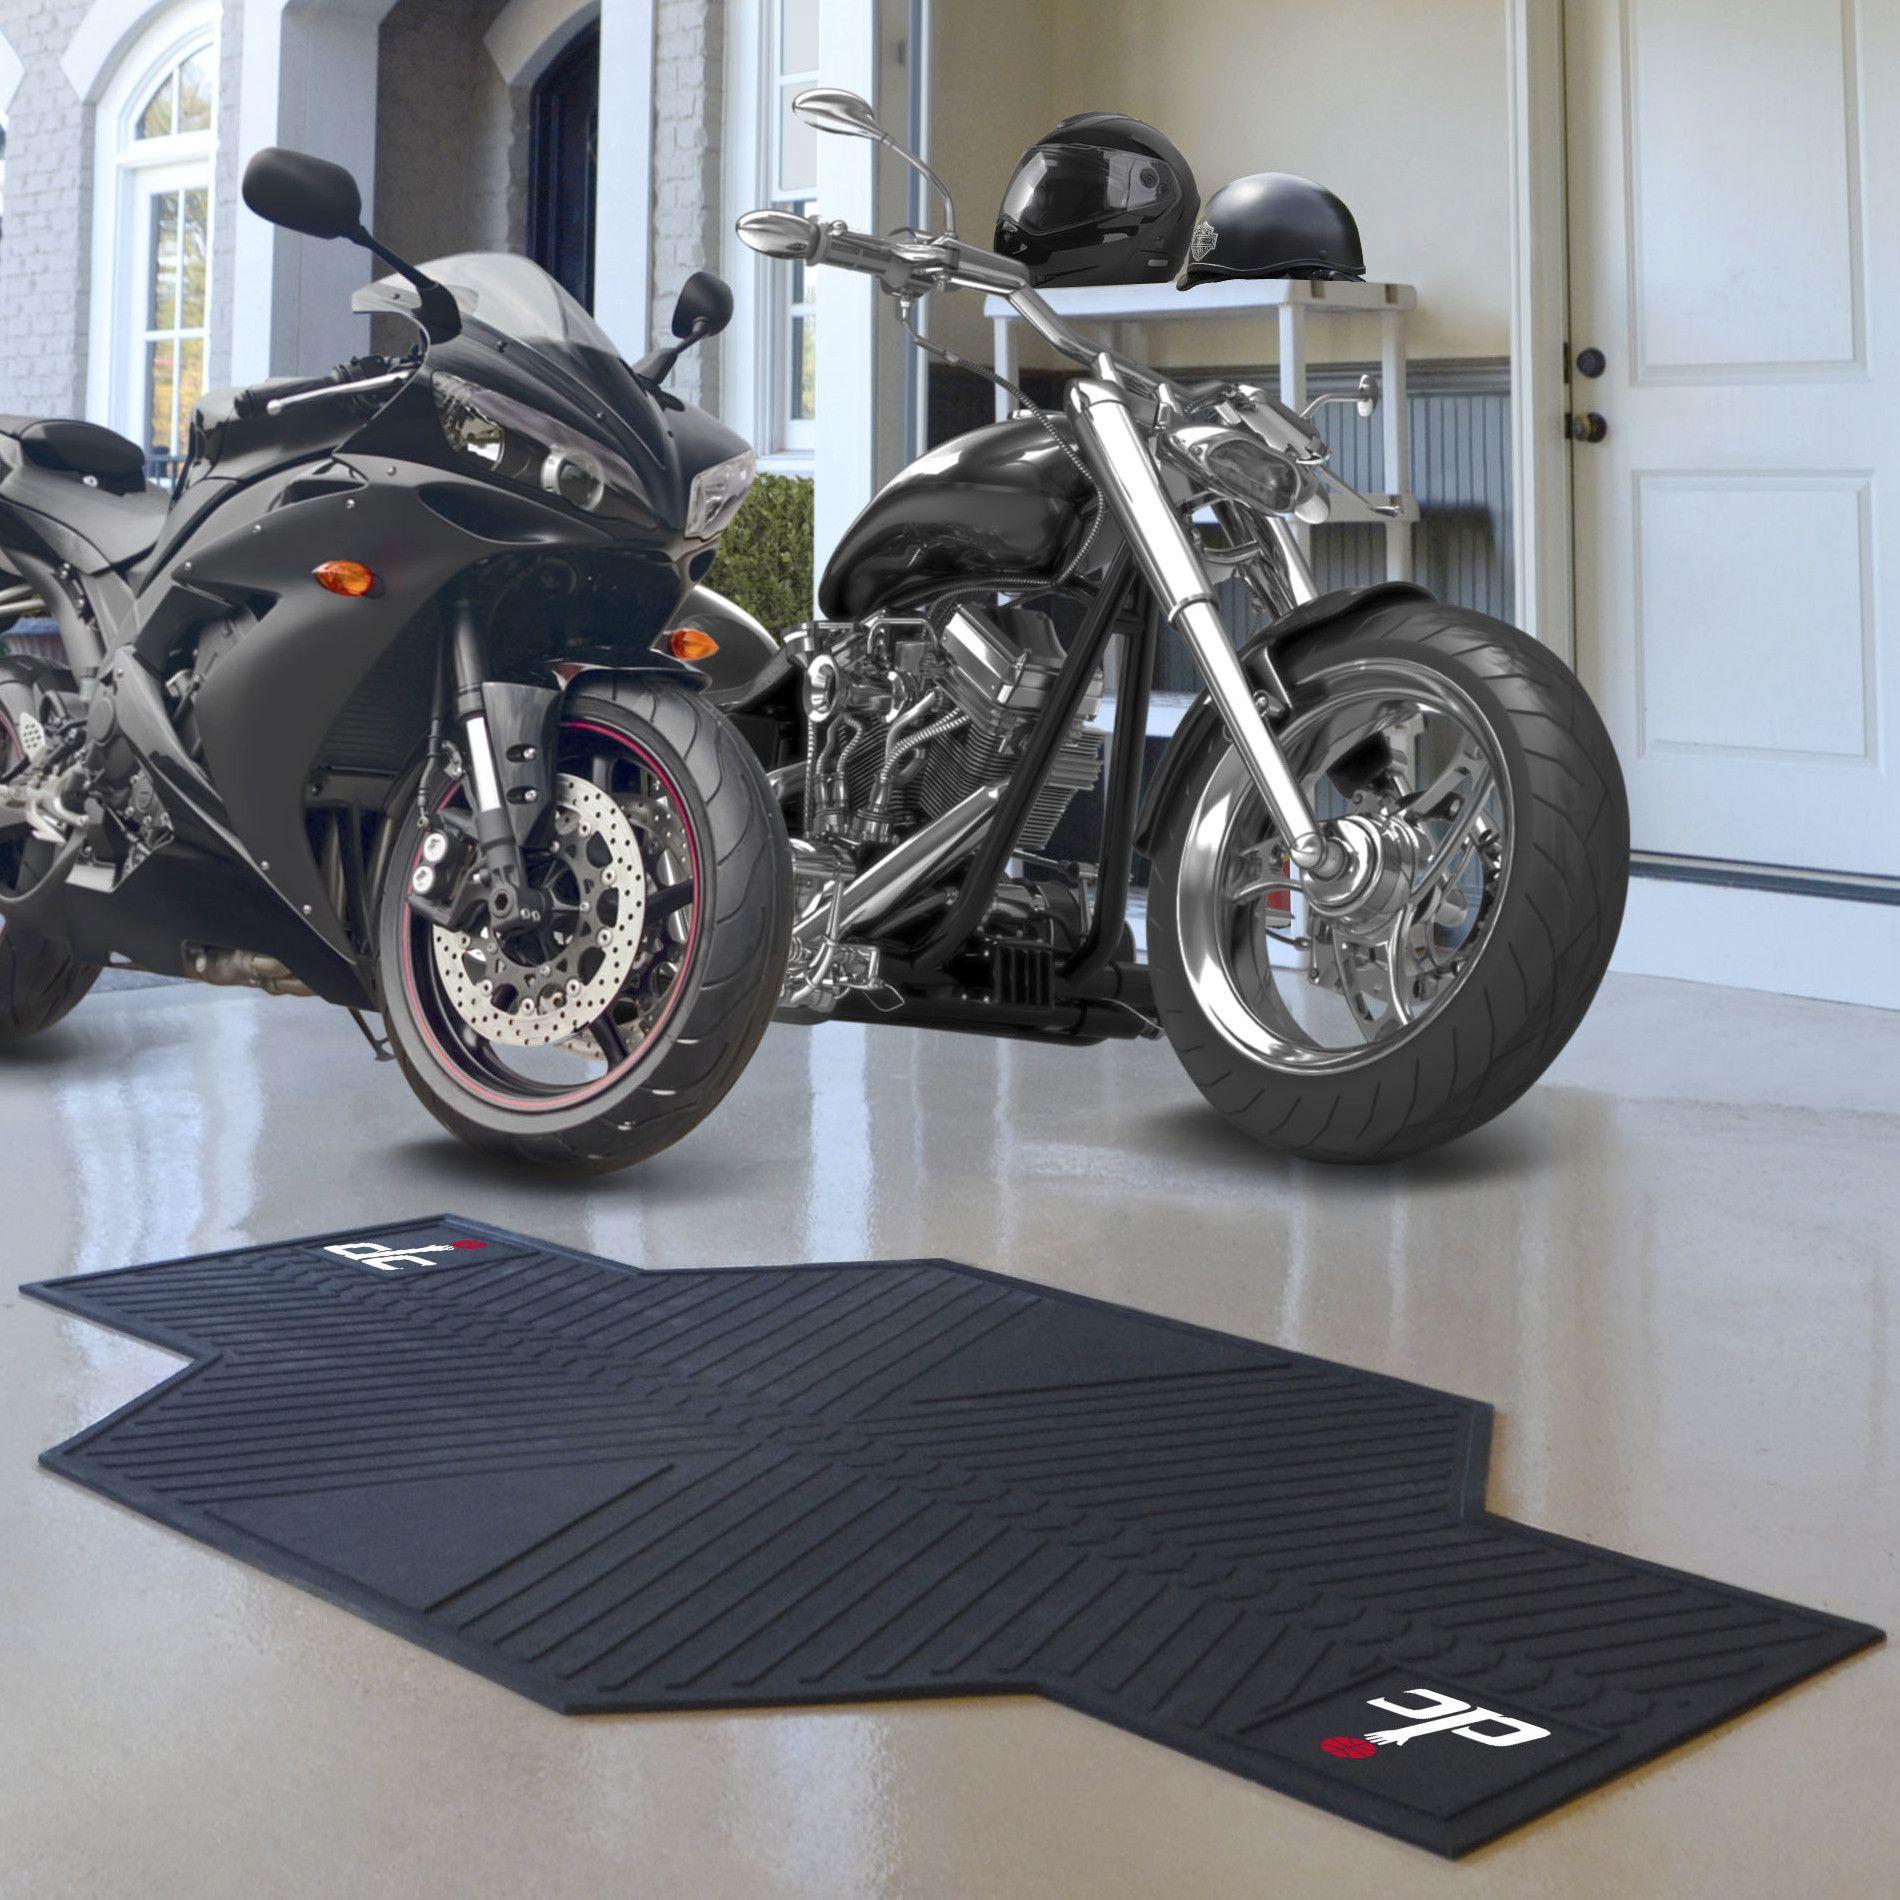 Nba Washington Wizards Motorcycle Utility 82 5 In X 42 In Non Slip Indoor Only Mat Motorcycle Garage Floor Mats Nfl Fans